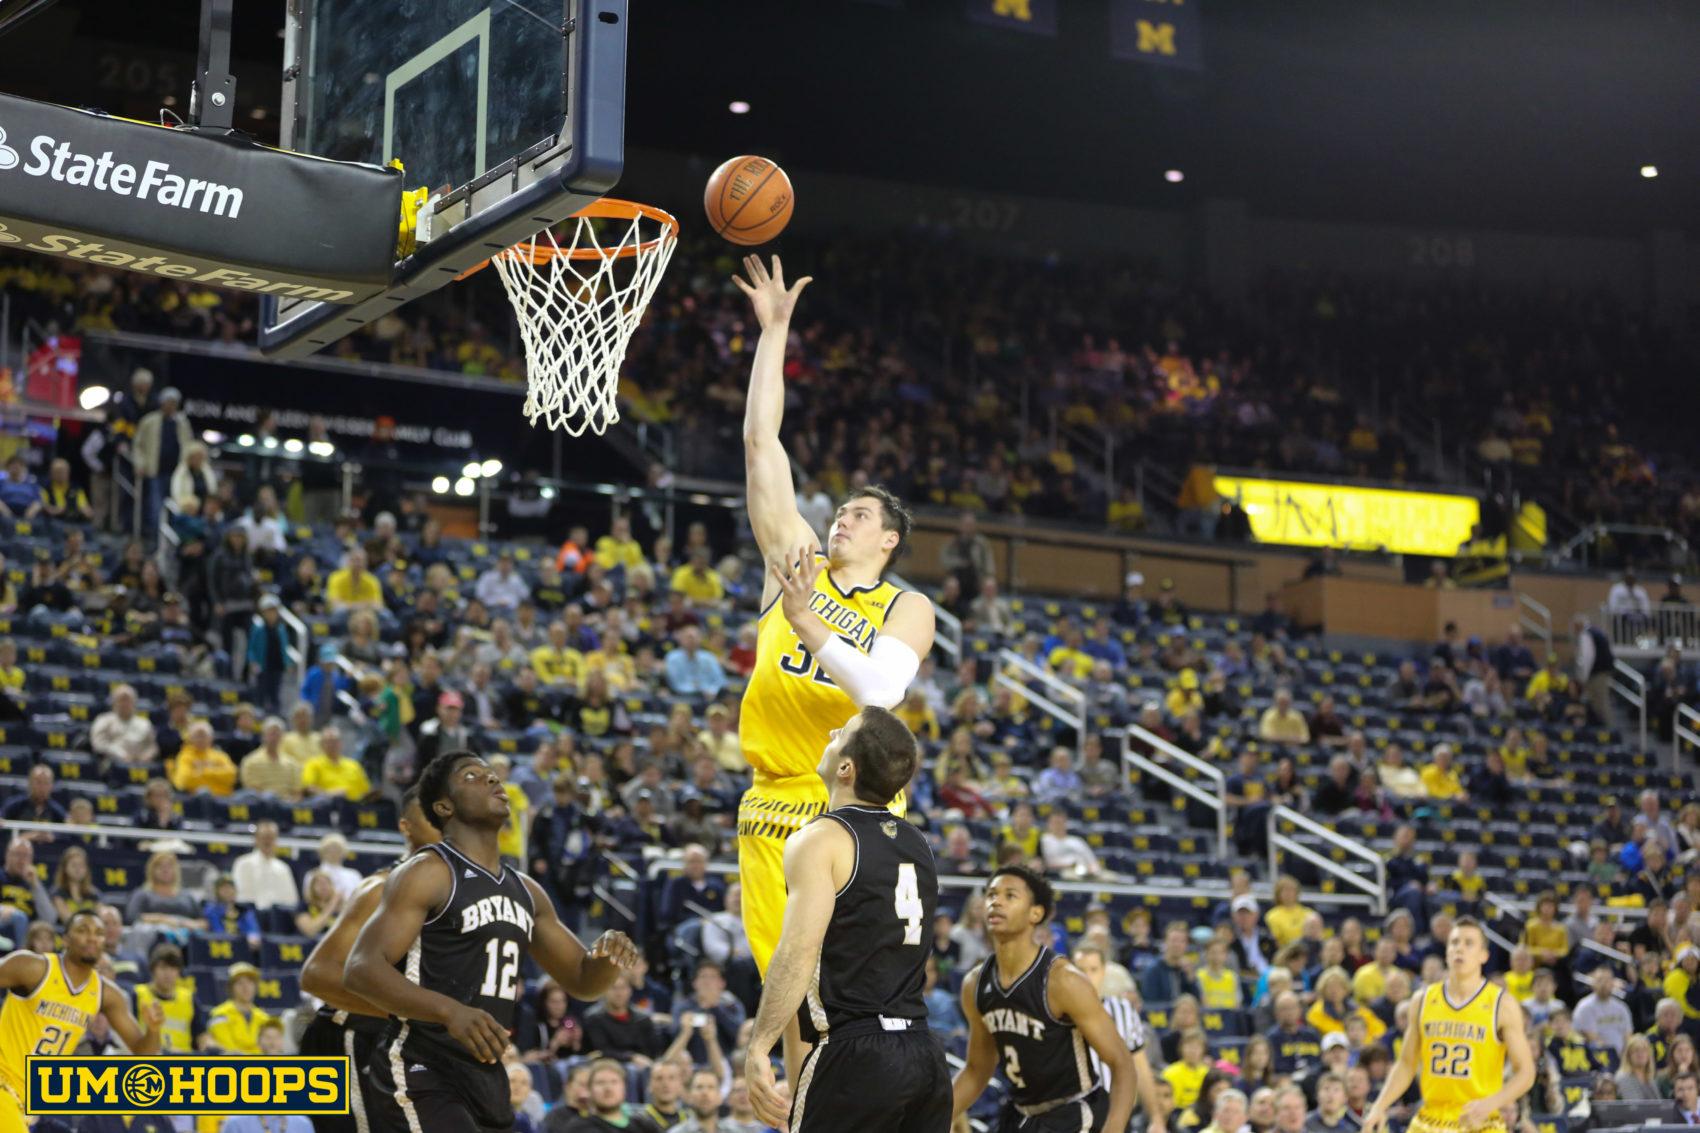 Michigan 96, Bryant 60